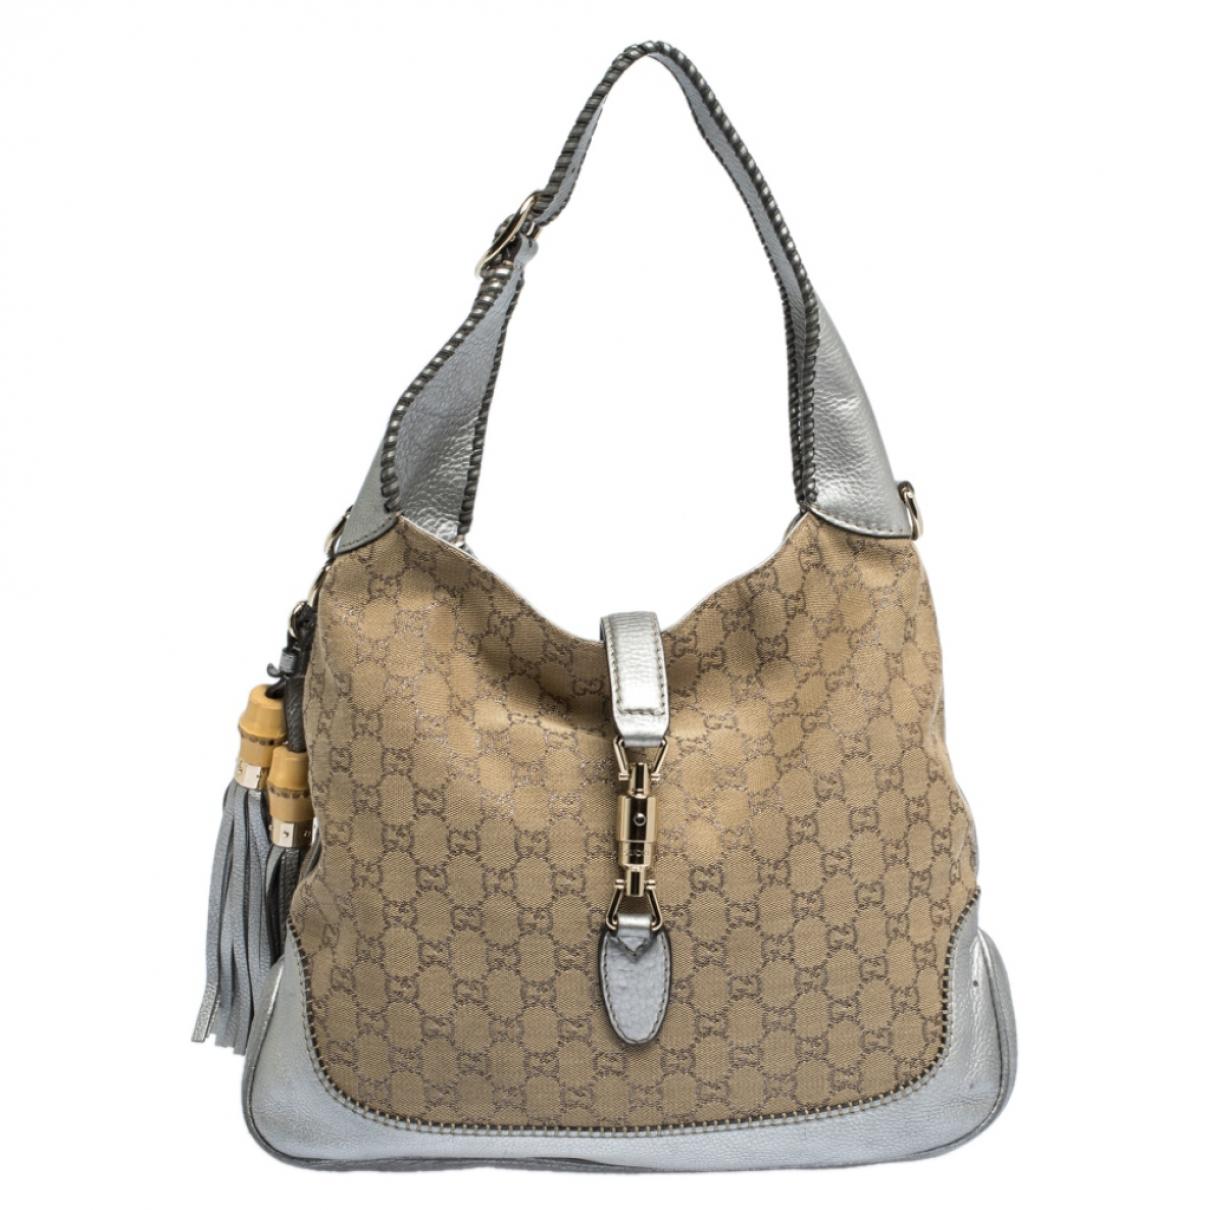 Gucci Jackie Beige Leather handbag for Women N